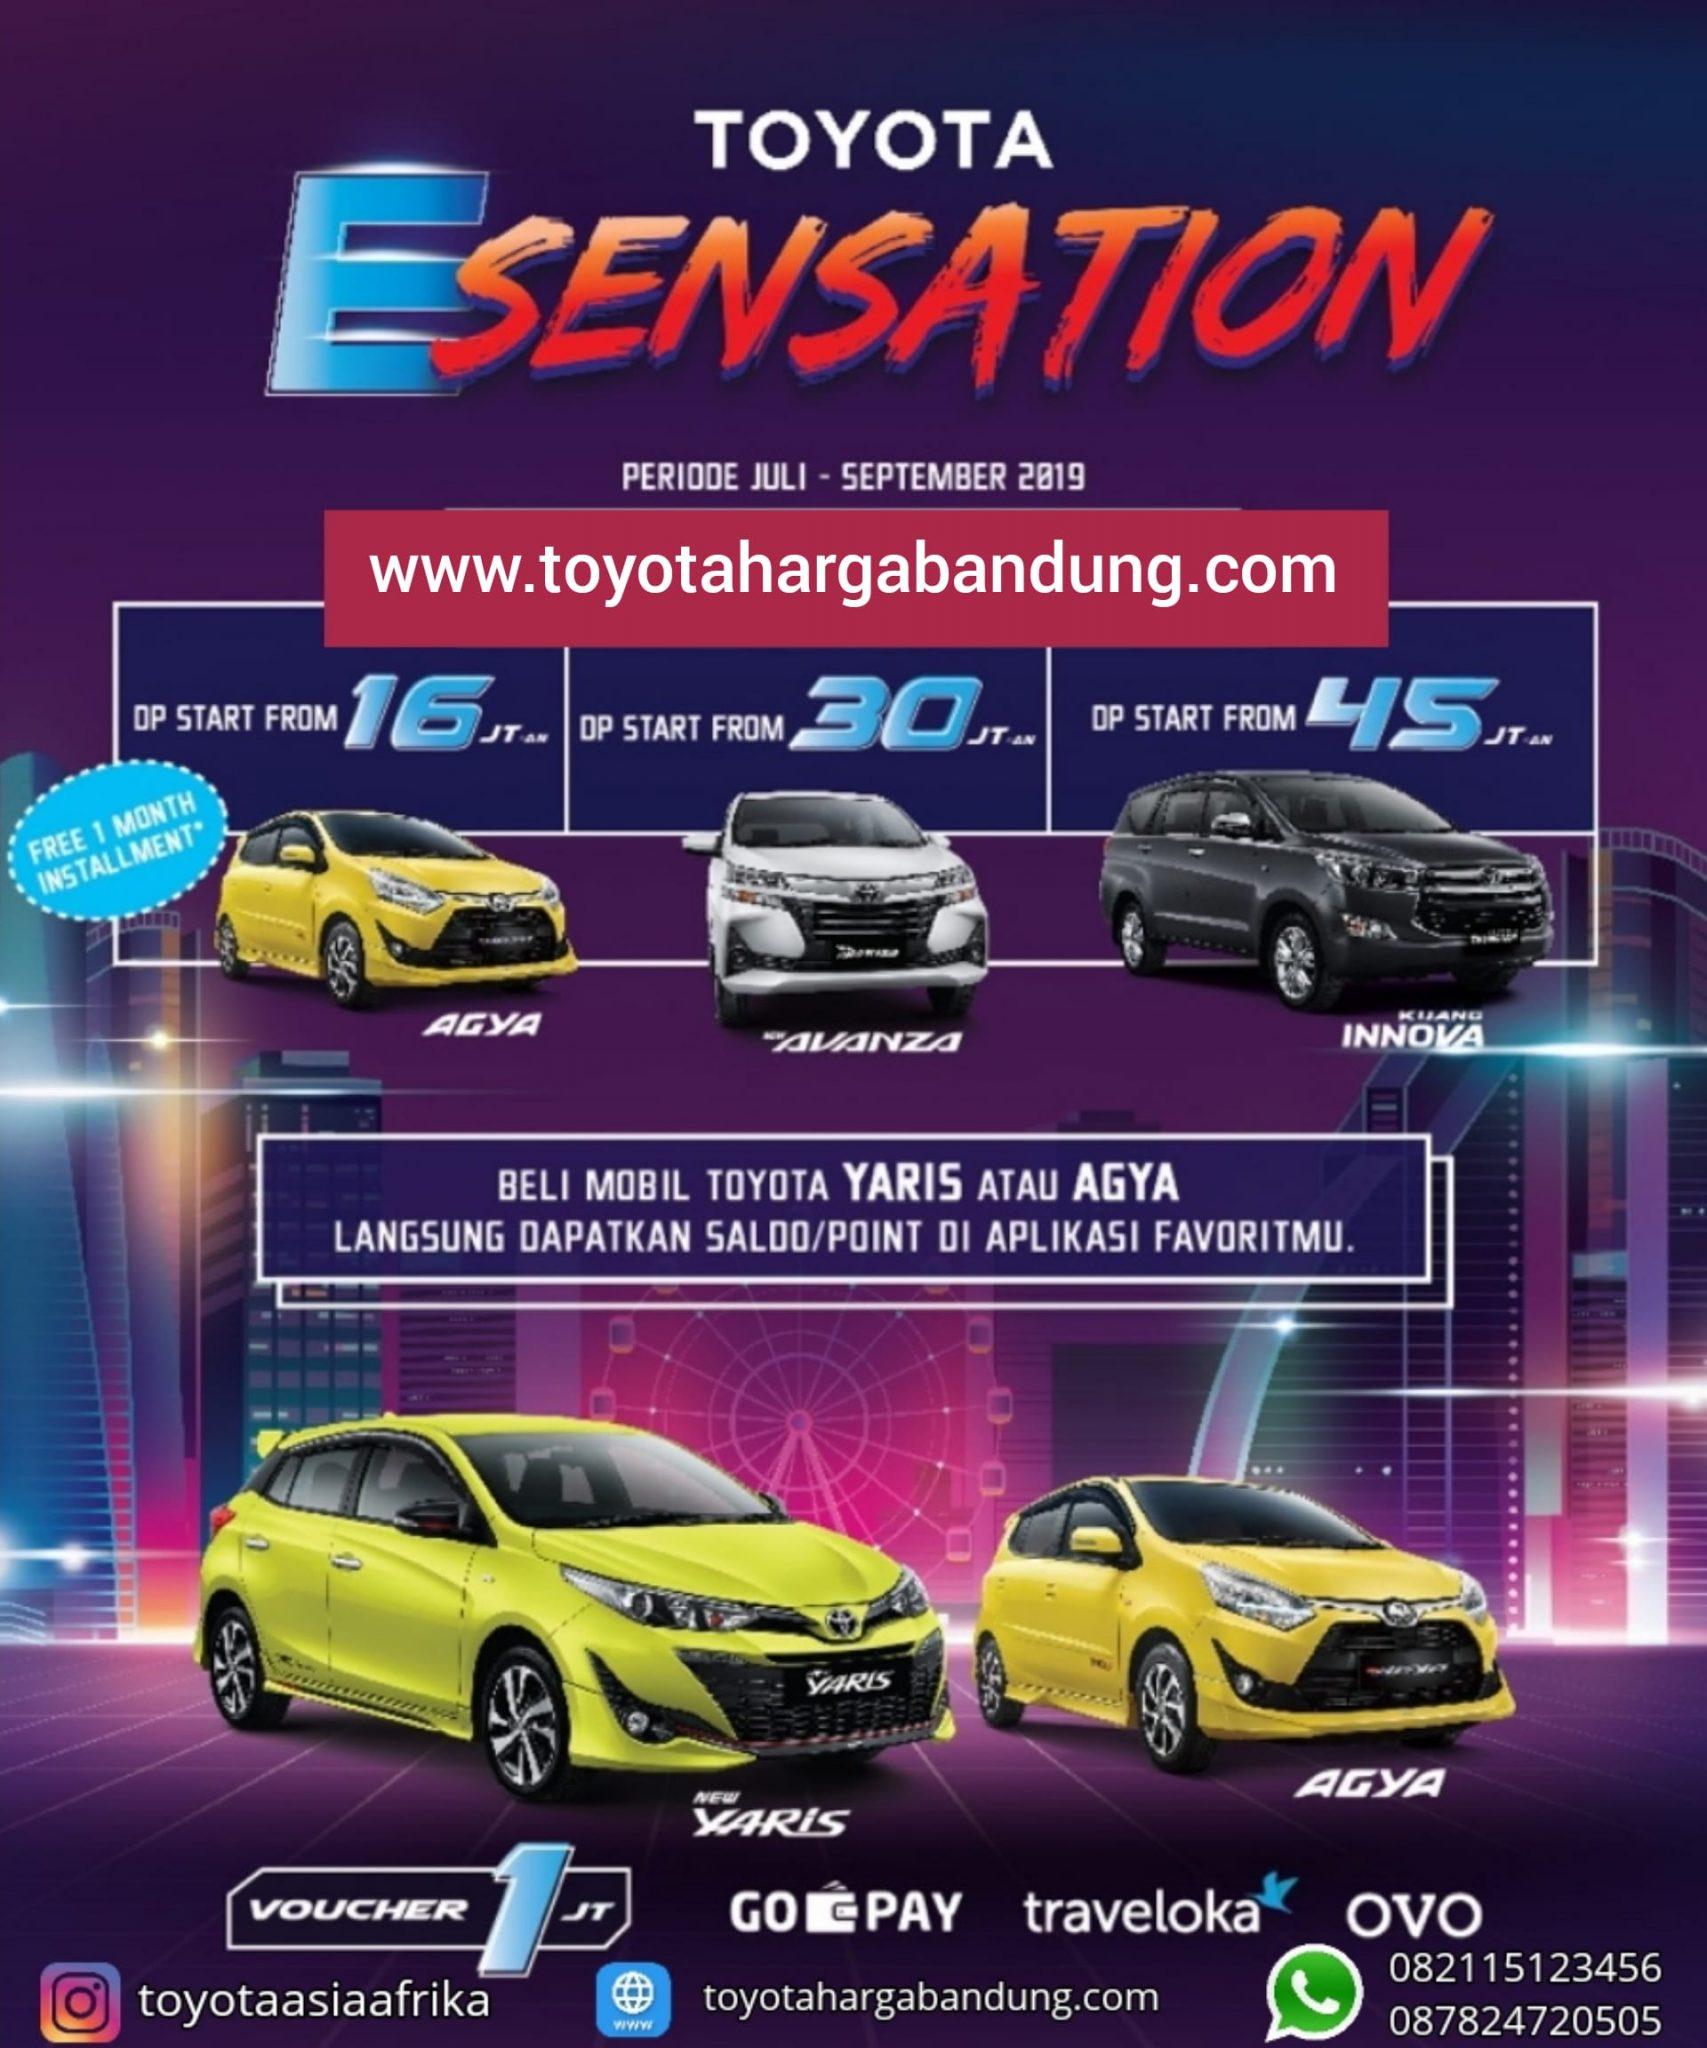 Promo Toyota Esensation 2